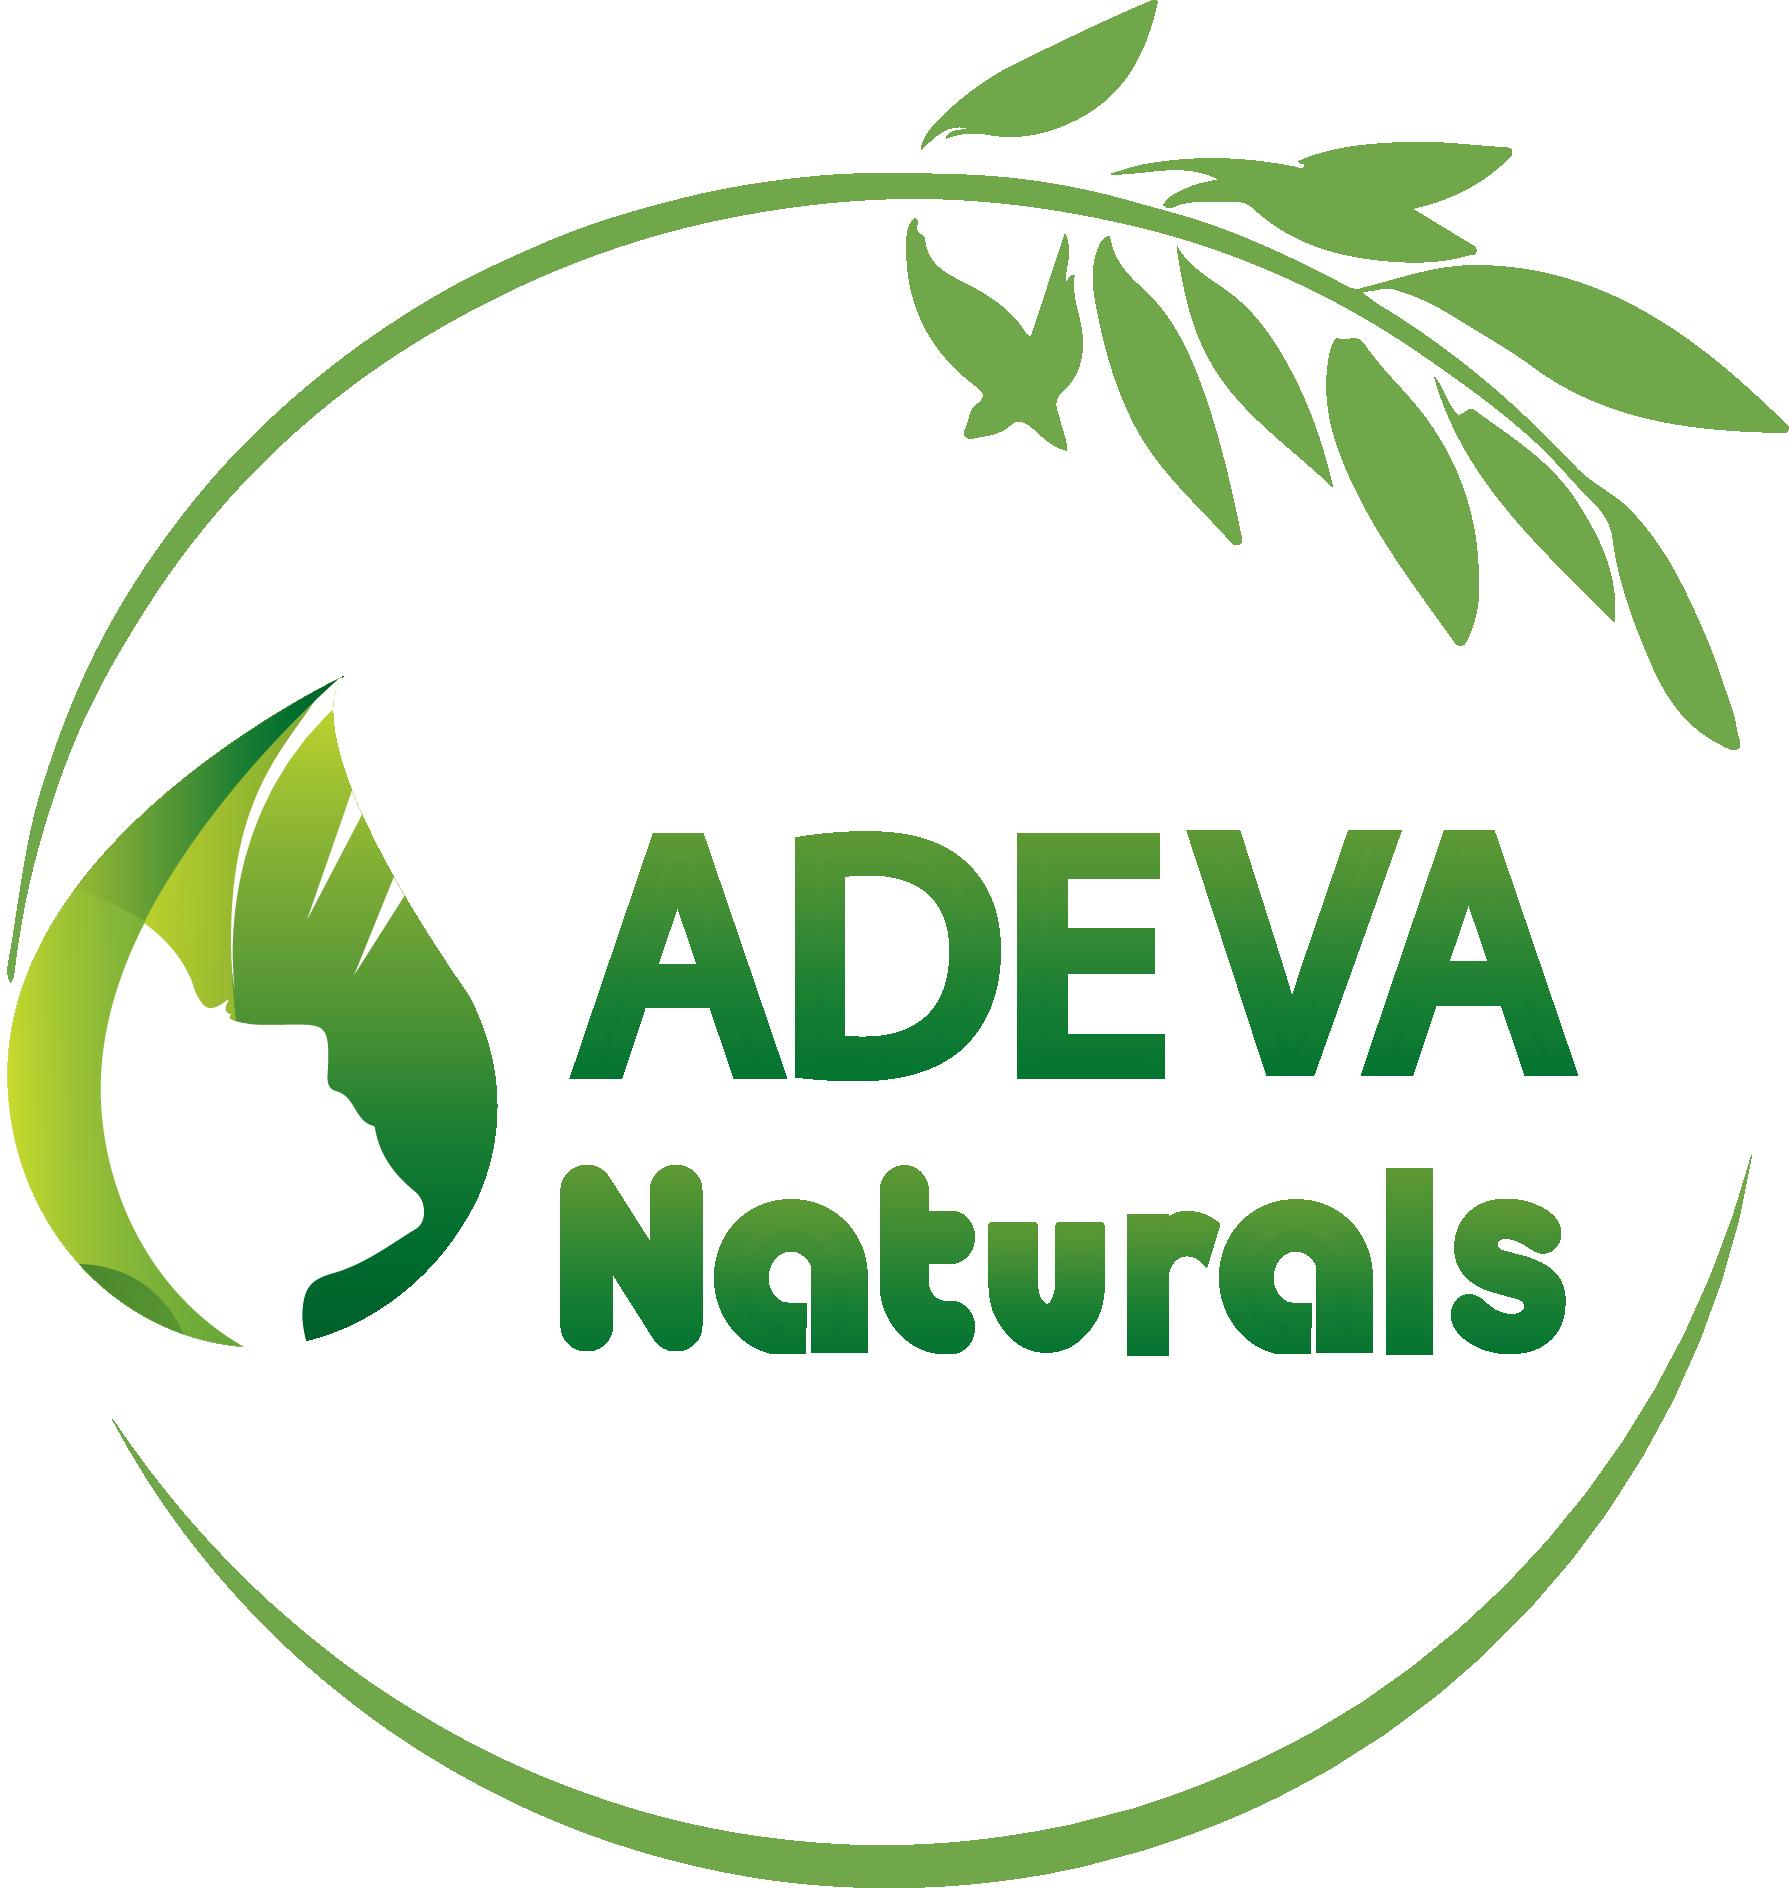 ADEVA NATURALS